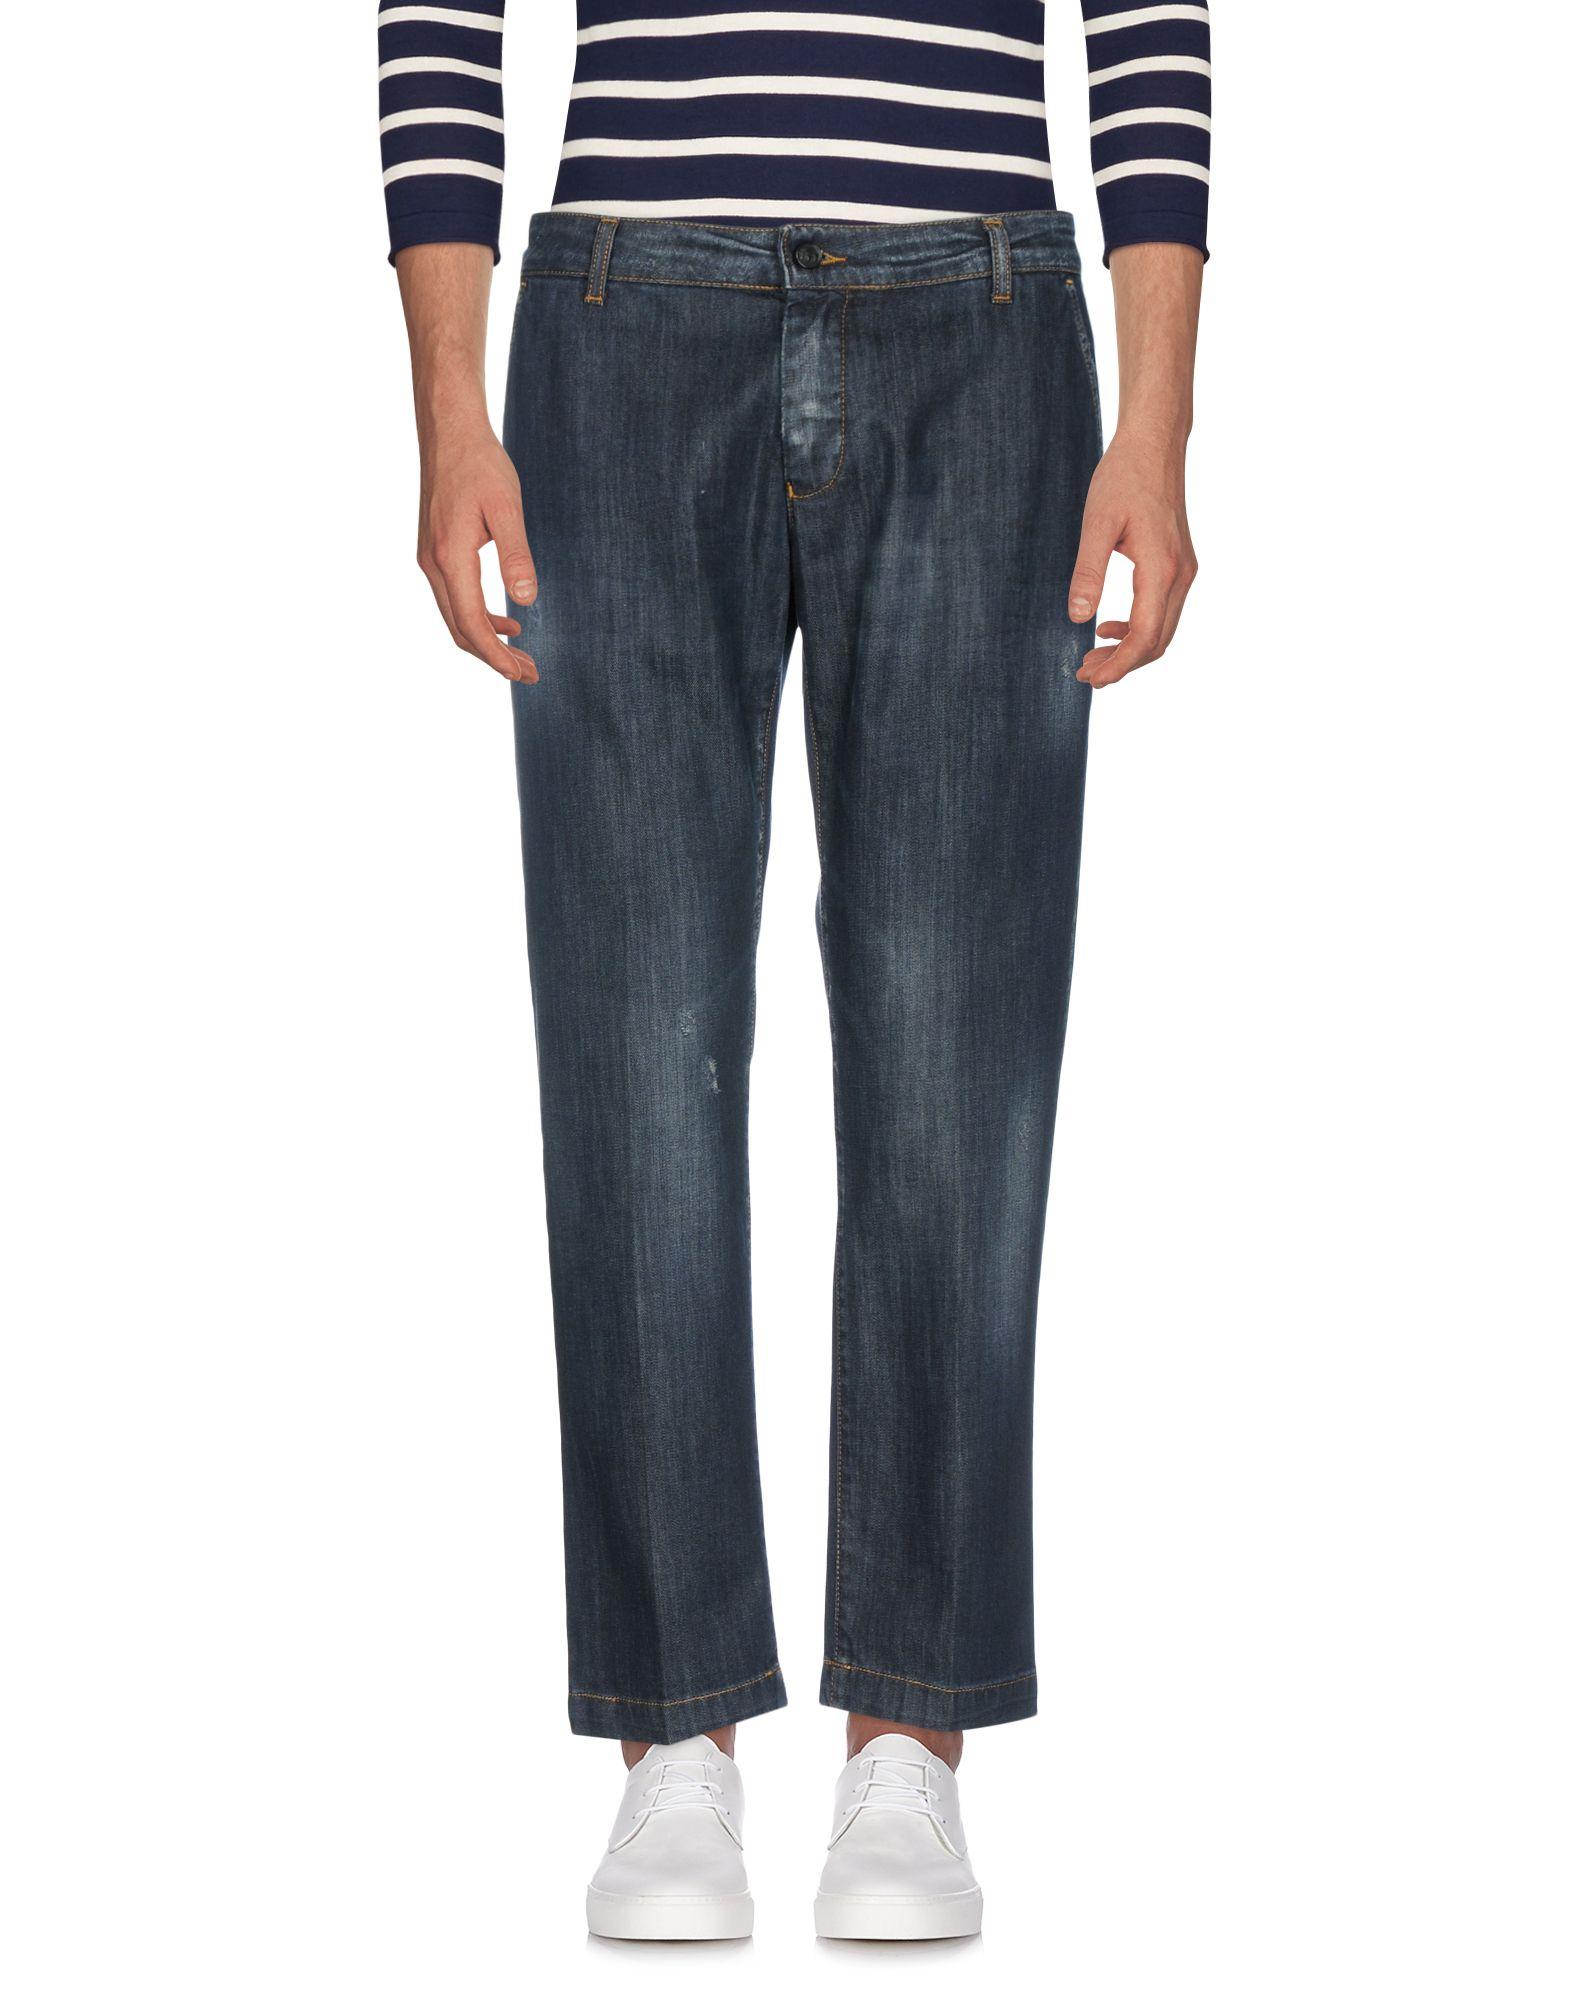 Pantaloni Jeans Entre Amis Uomo - Acquista online su